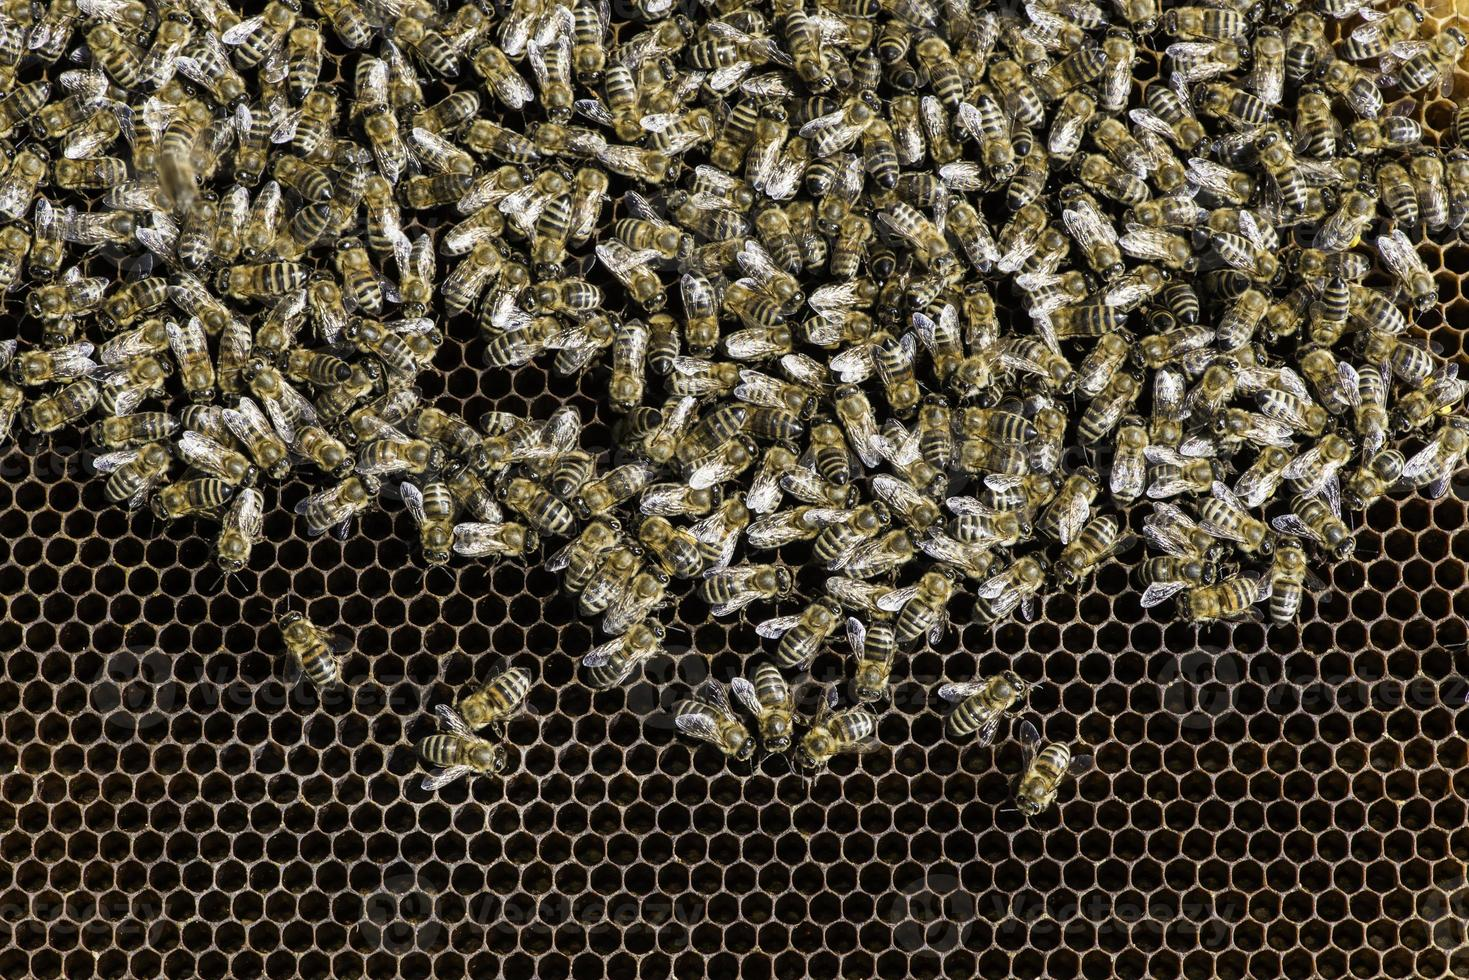 vicino a nido d'ape foto